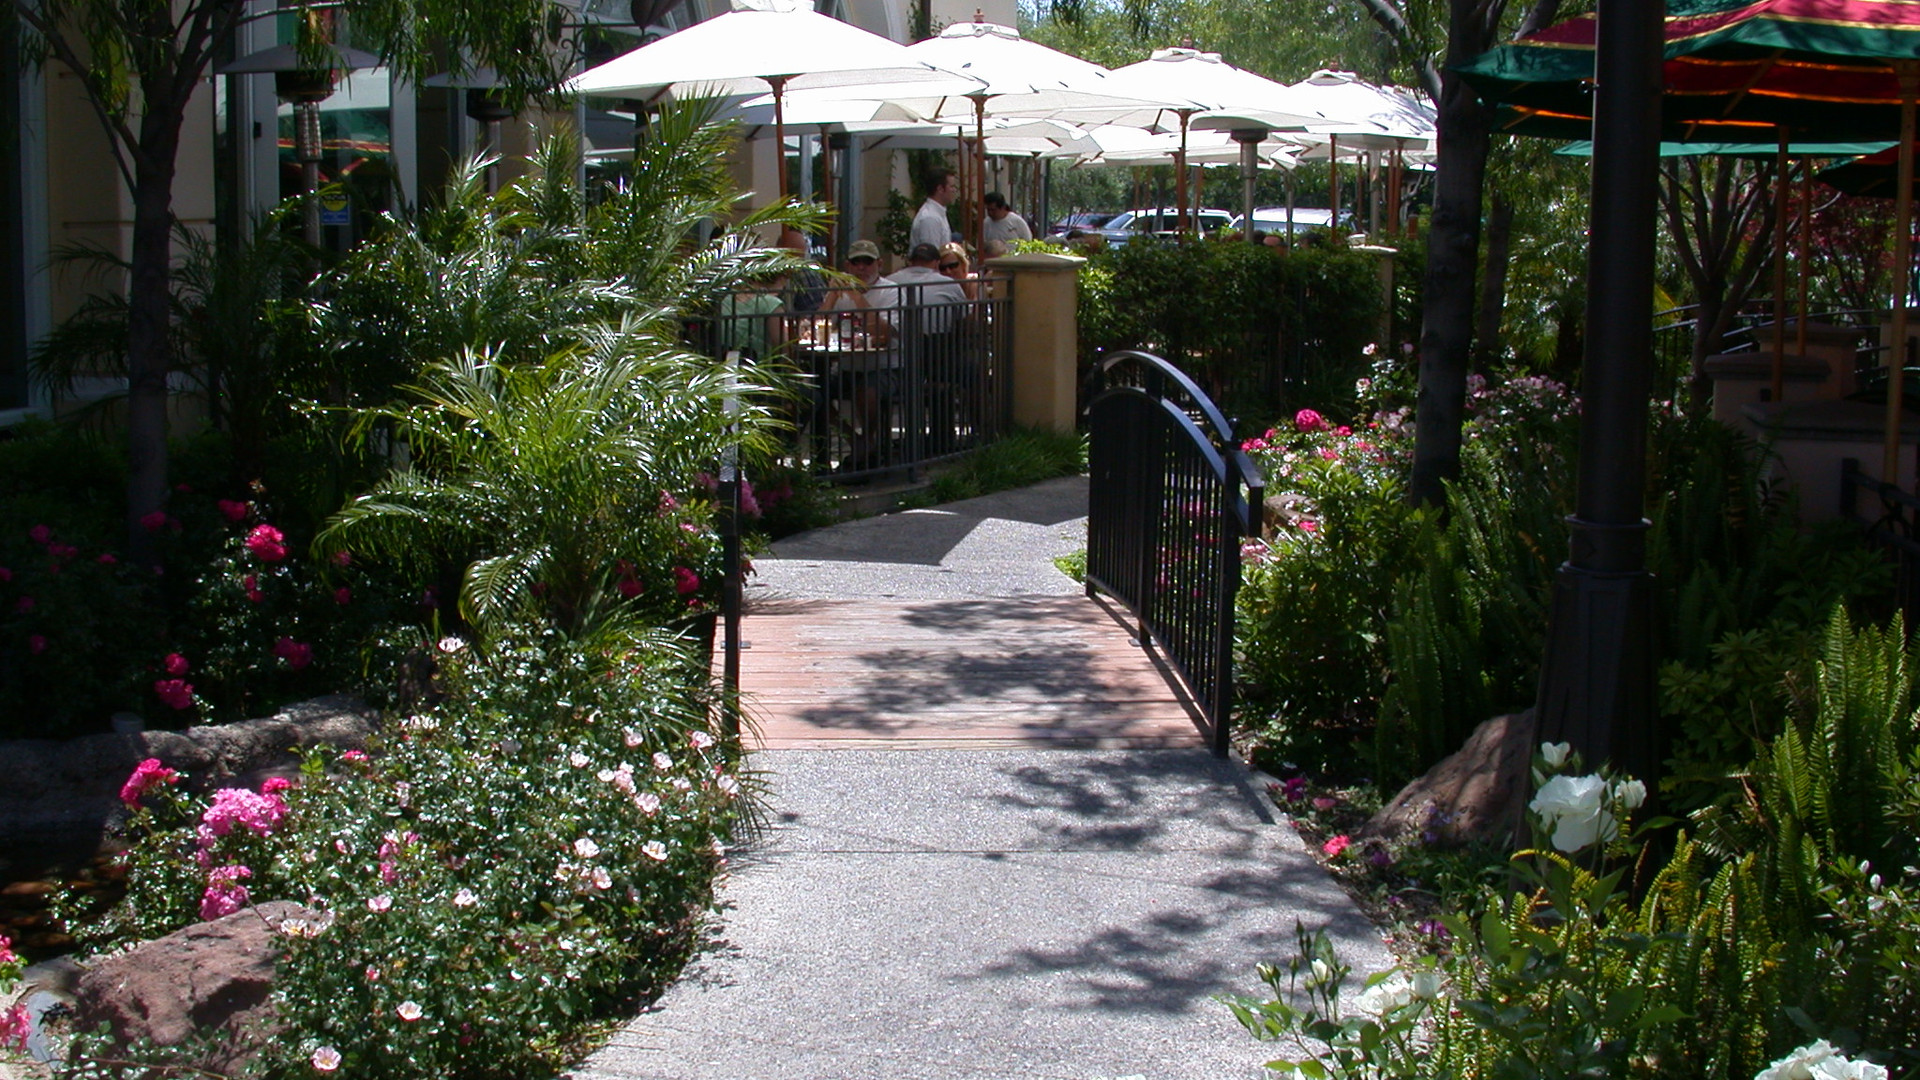 Restaurant path